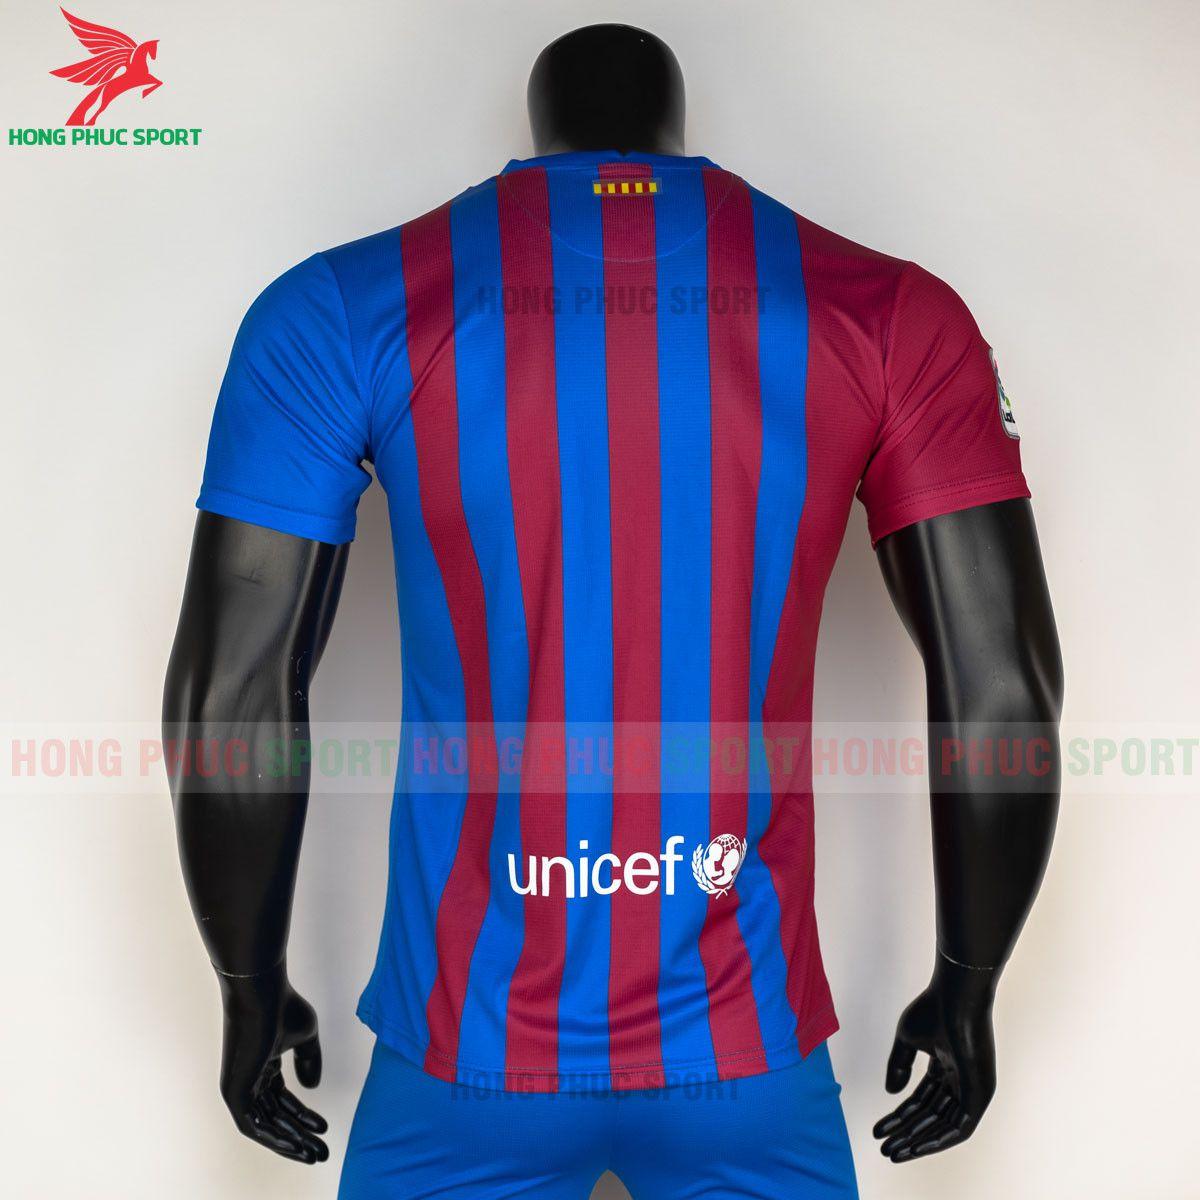 https://cdn.hongphucsport.com/unsafe/s4.shopbay.vn/files/285/ao-bong-da-barcelona-2021-2022-san-nha-hang-thai-7-60d2fcf2732e6.jpg